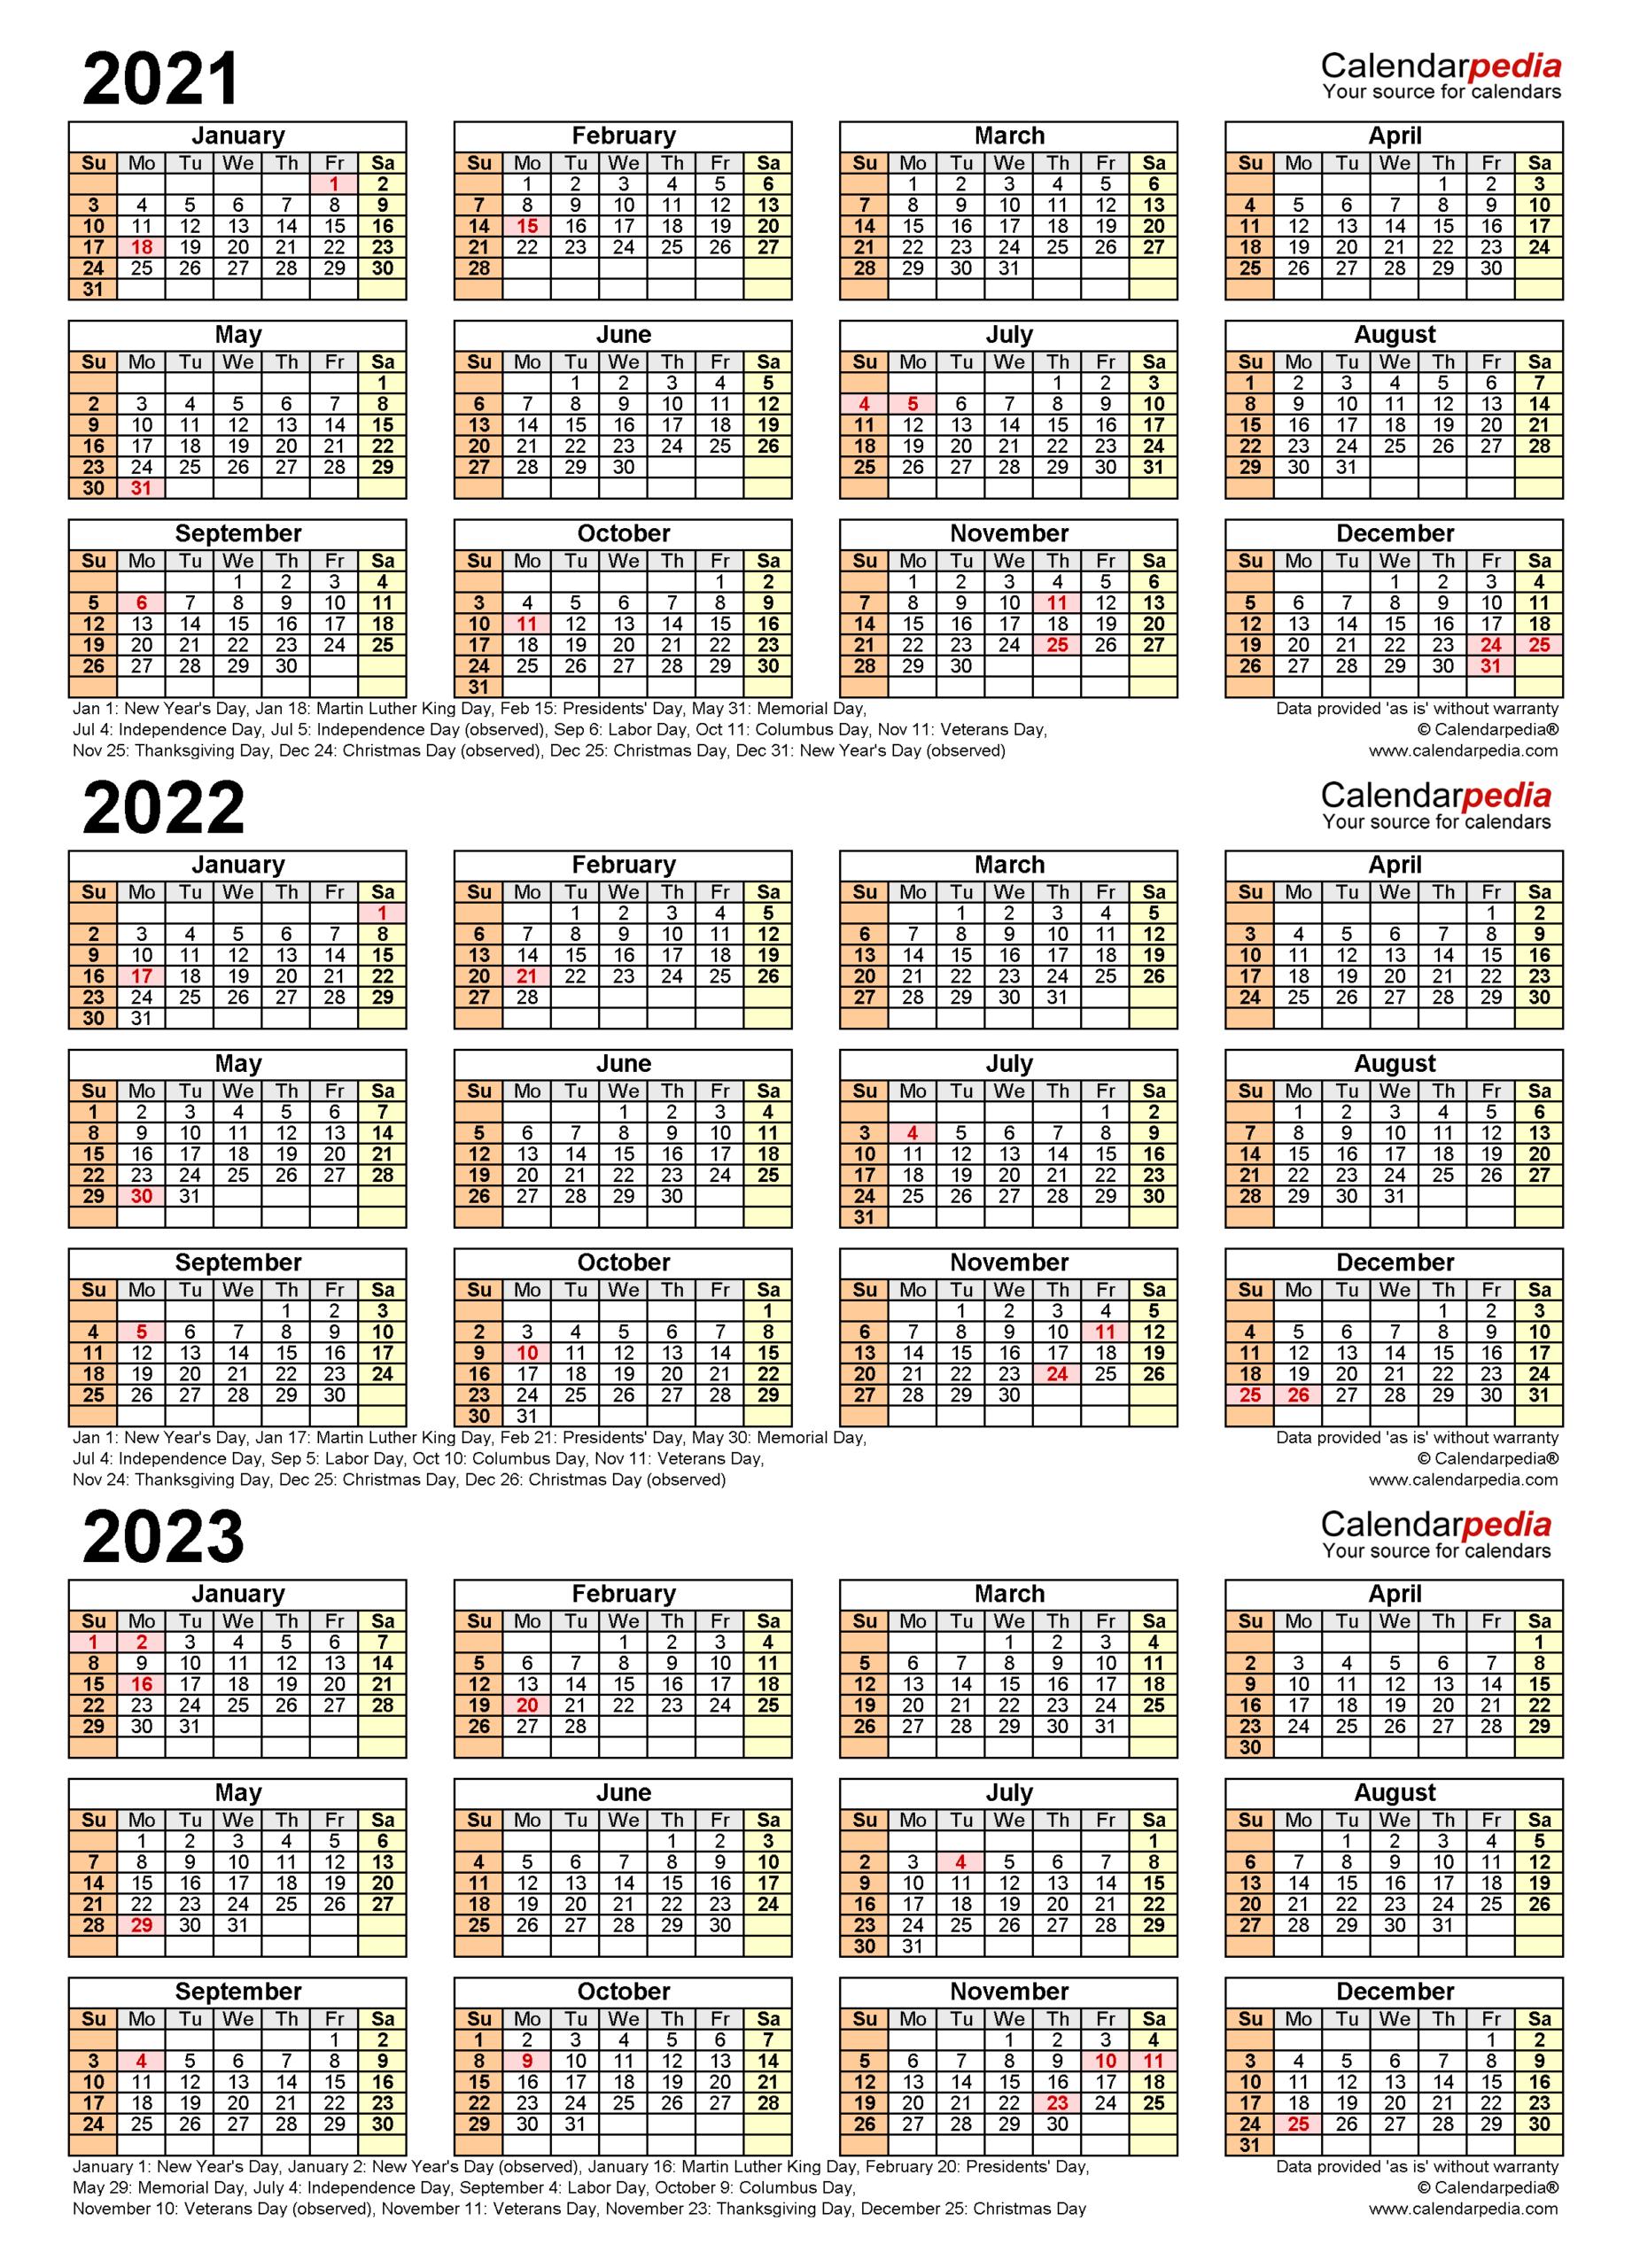 2021-2023 Three Year Calendar - Free Printable Word Templates throughout Three Year Printable Calendar 2021 To 2023